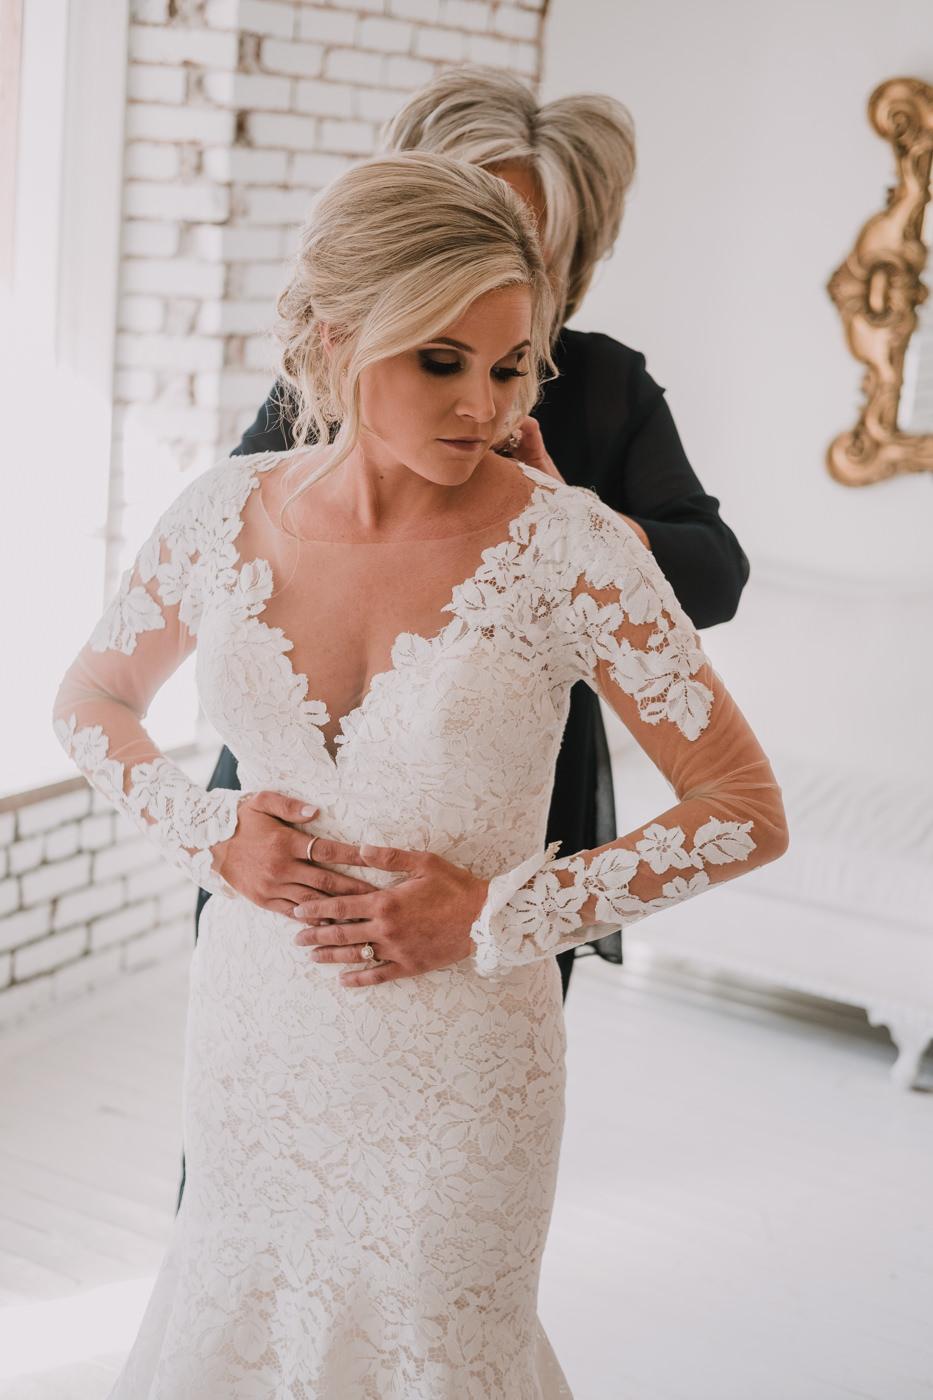 ravington.wedding.northwestarkansas.mileswittboyer-10.jpg